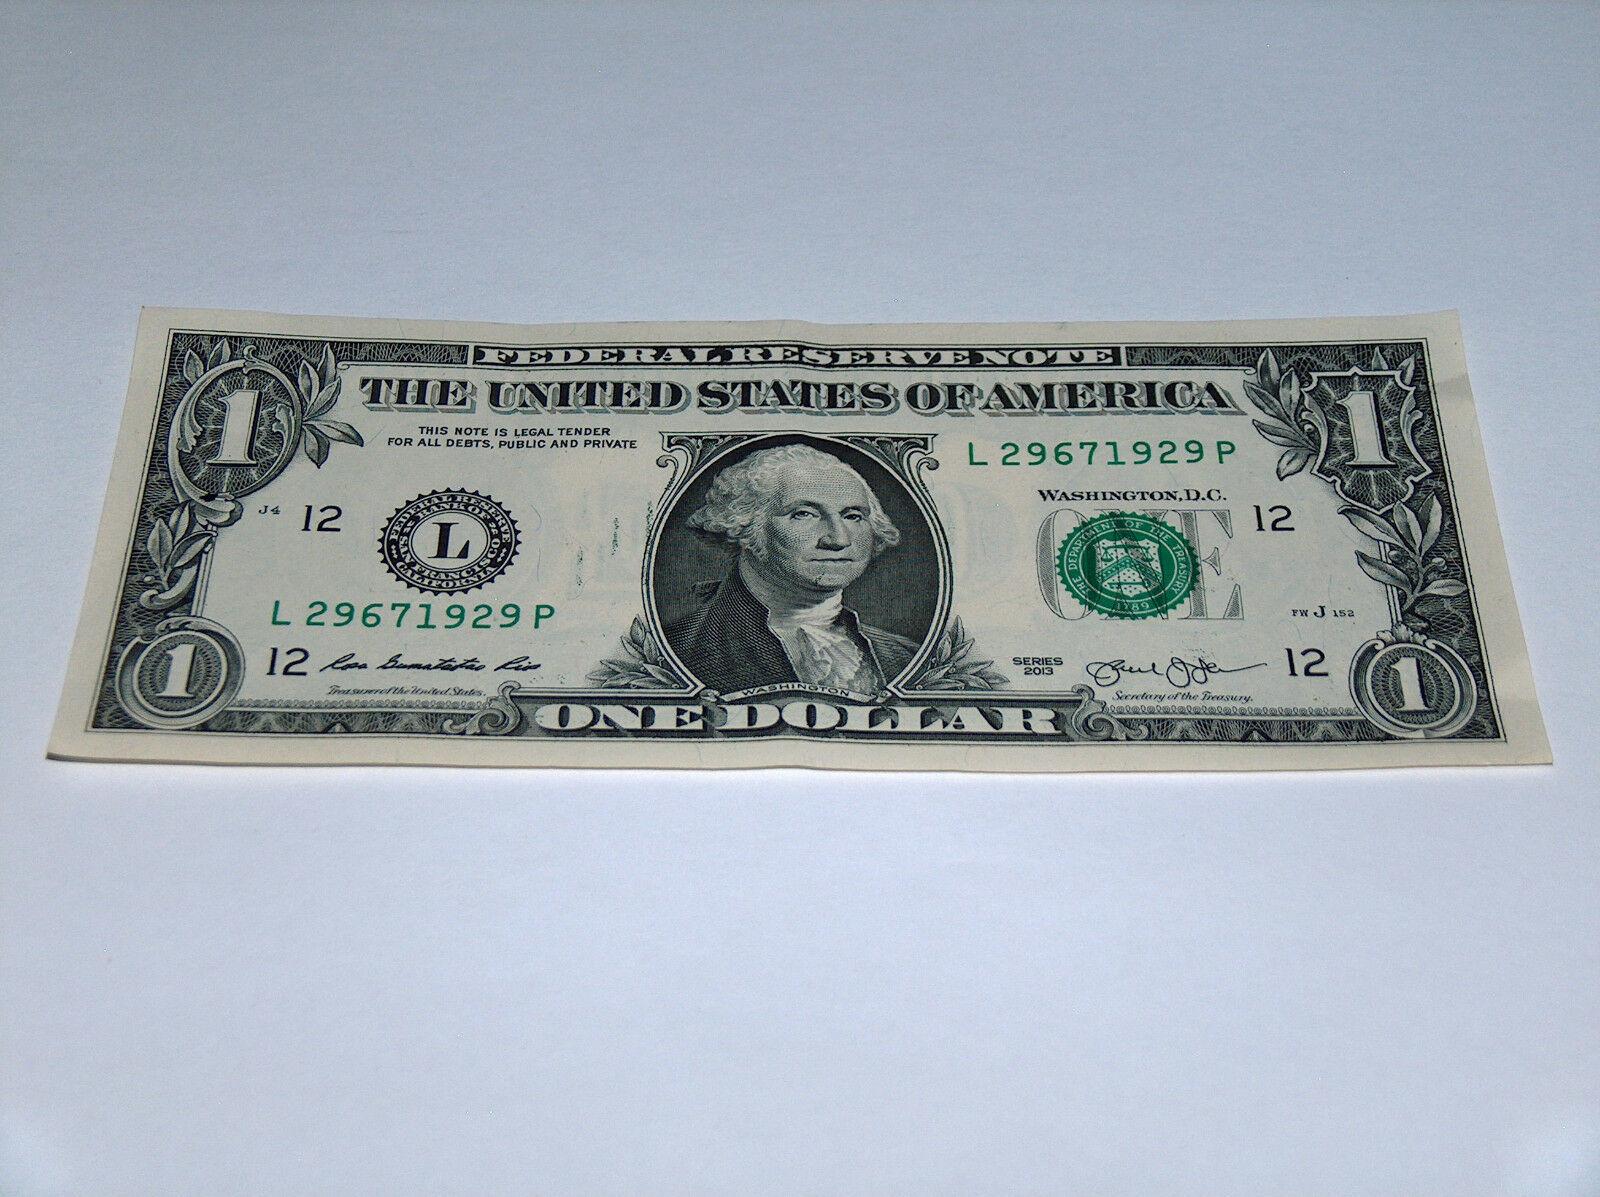 2013 Dollar Bill US Bank Note Year Date Birthday 2967 1929 Fancy Money Serial